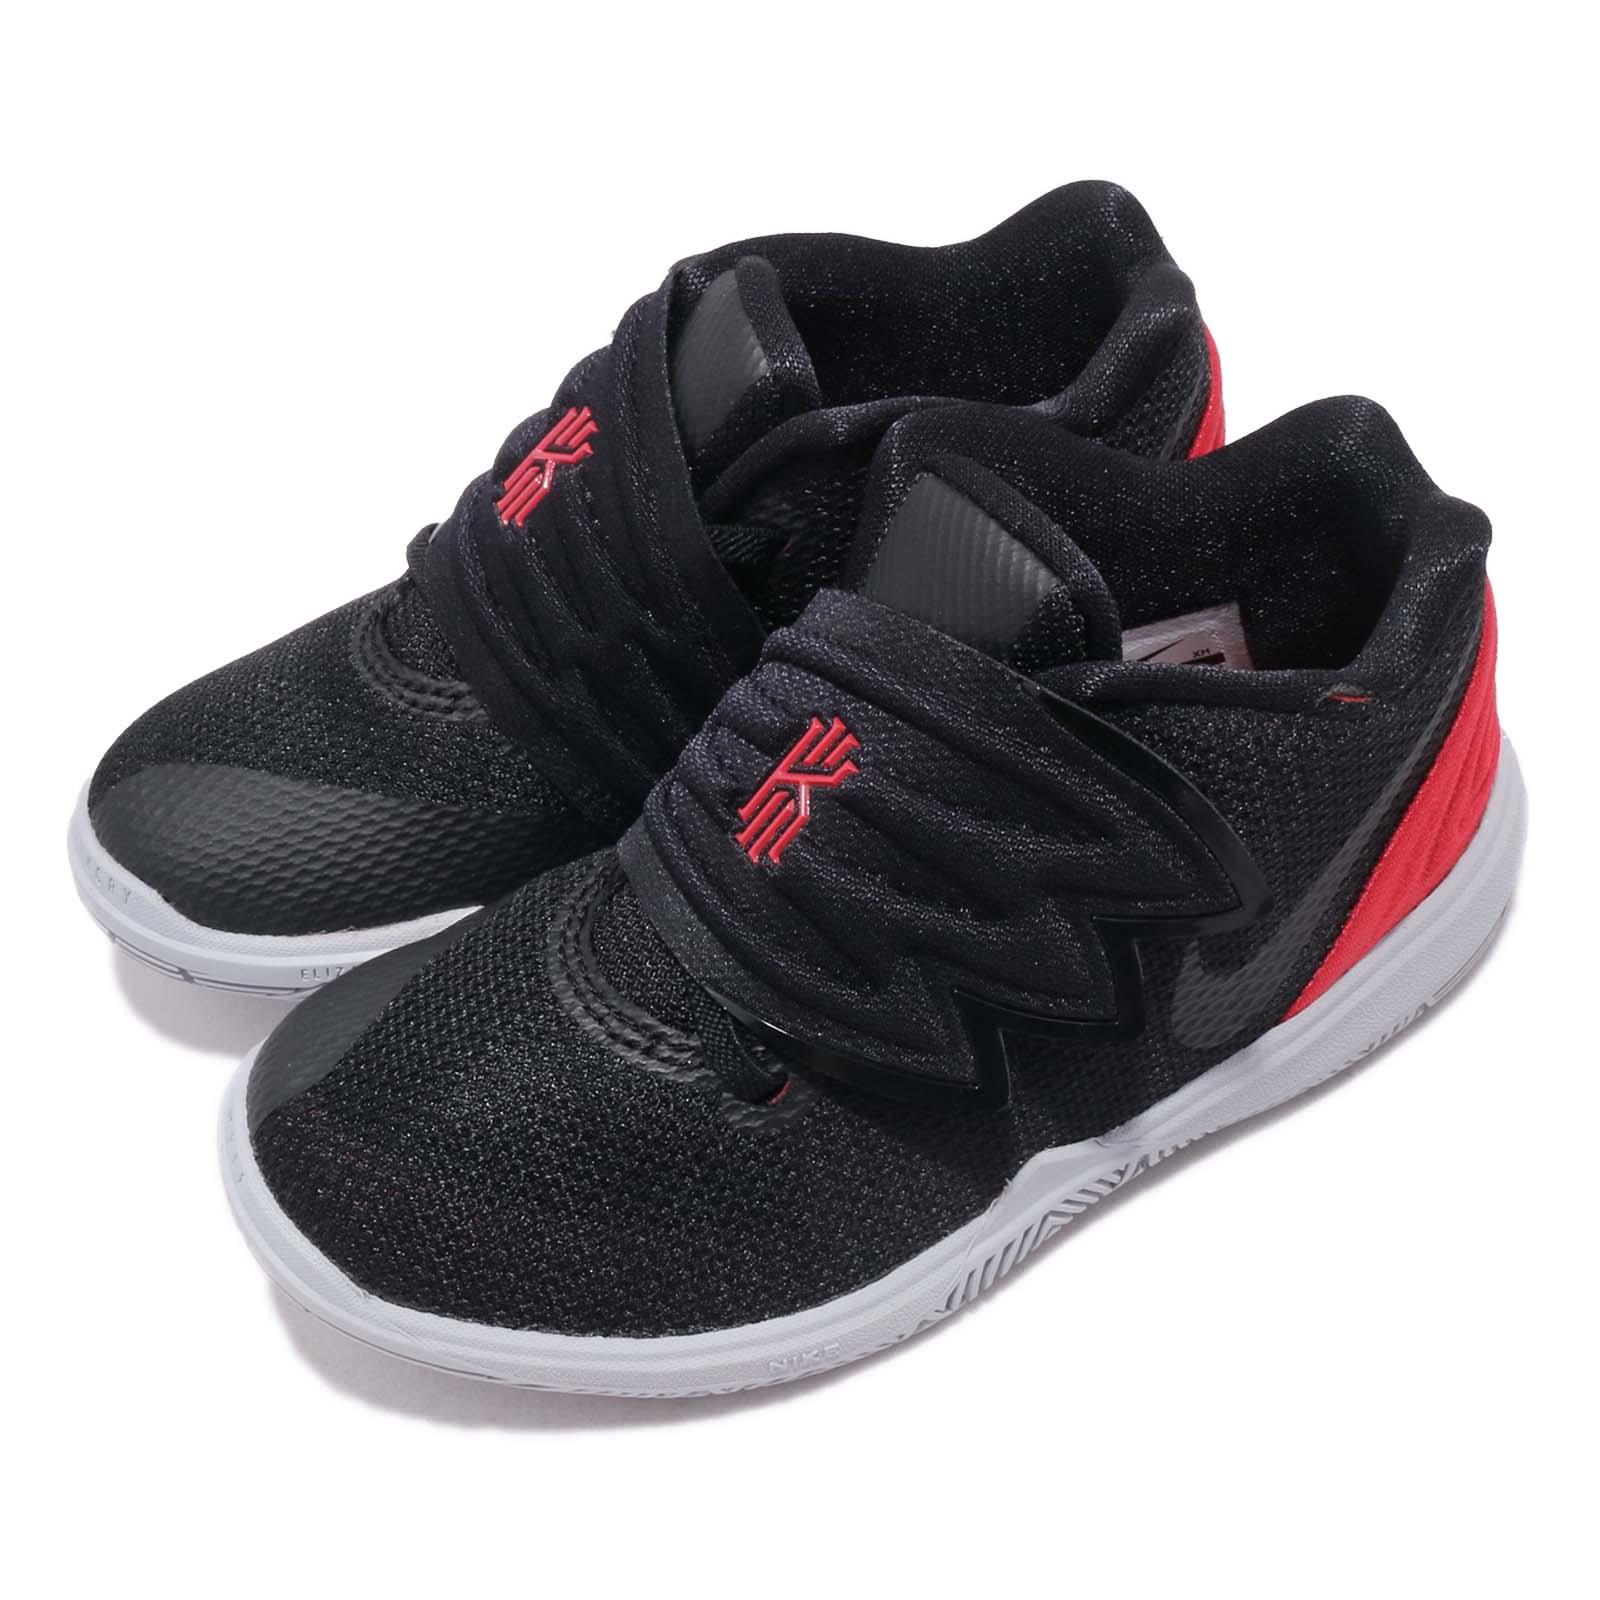 Nike 籃球鞋 Kyrie 5 TD 明星款 運動 童鞋 AQ2459-600